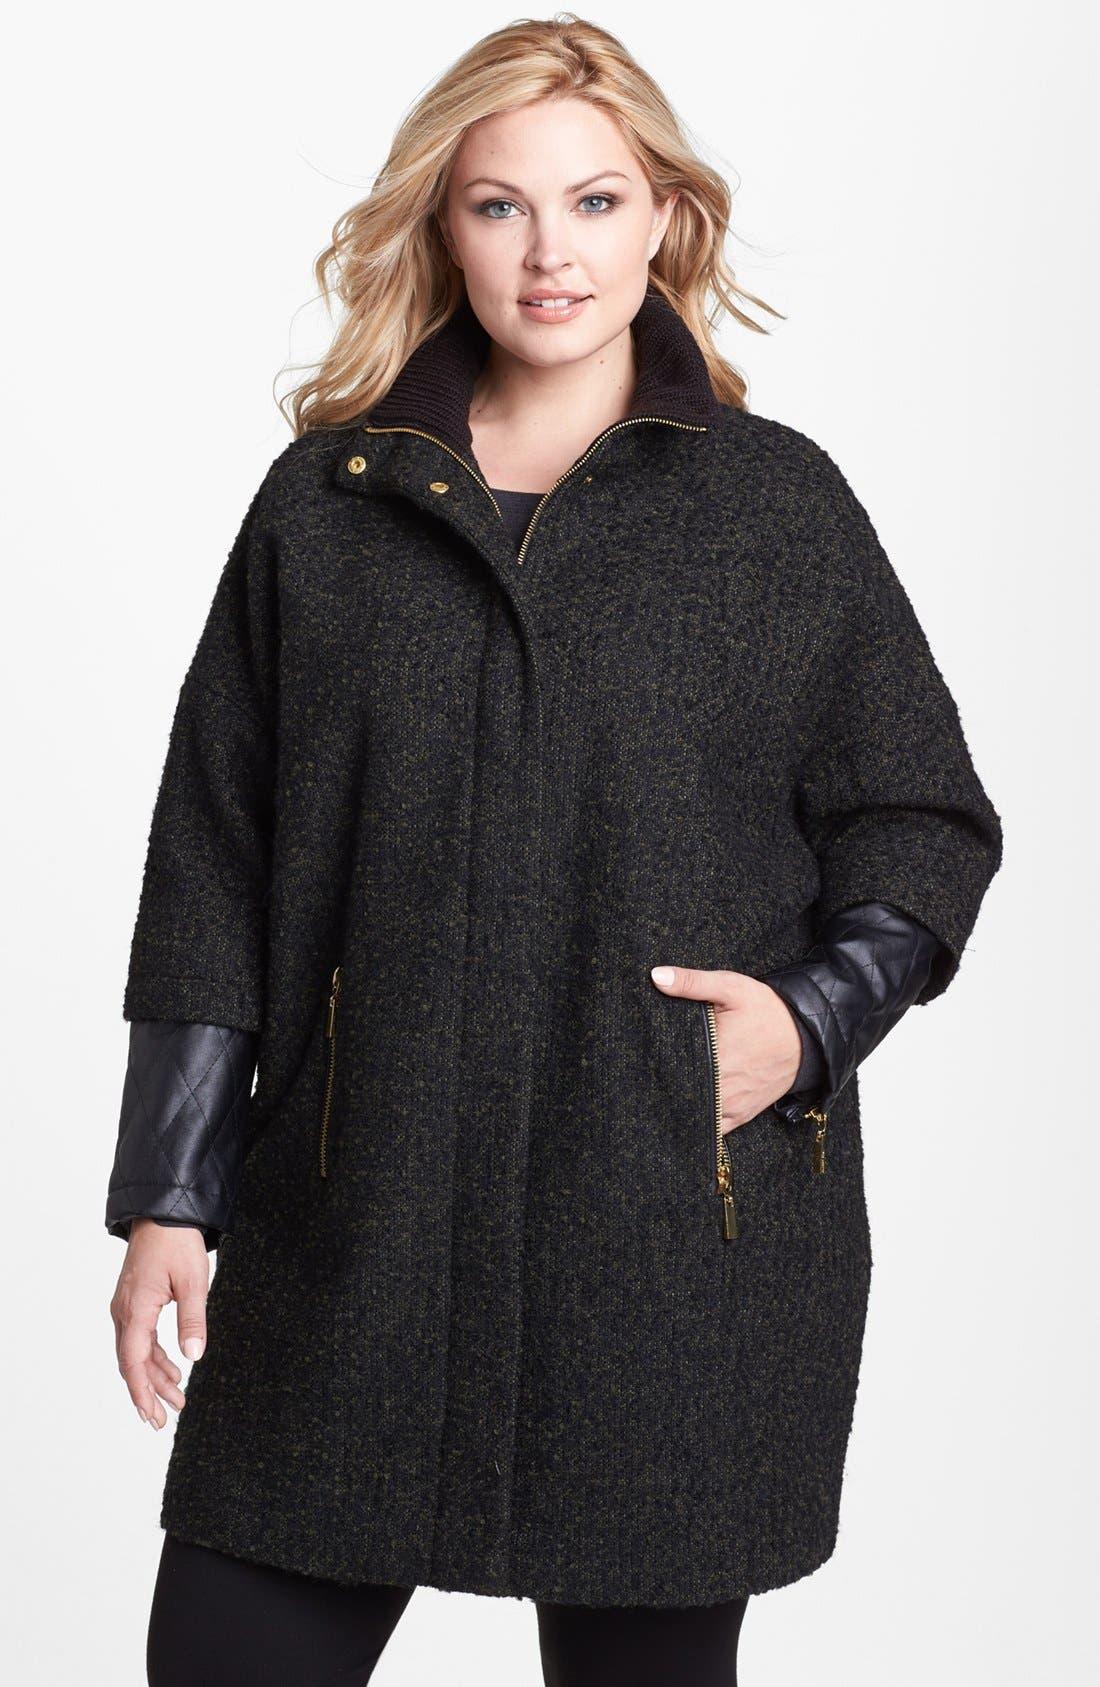 Alternate Image 1 Selected - Vince Camuto Faux Leather Sleeve Bouclé Tweed Coat (Plus Size)